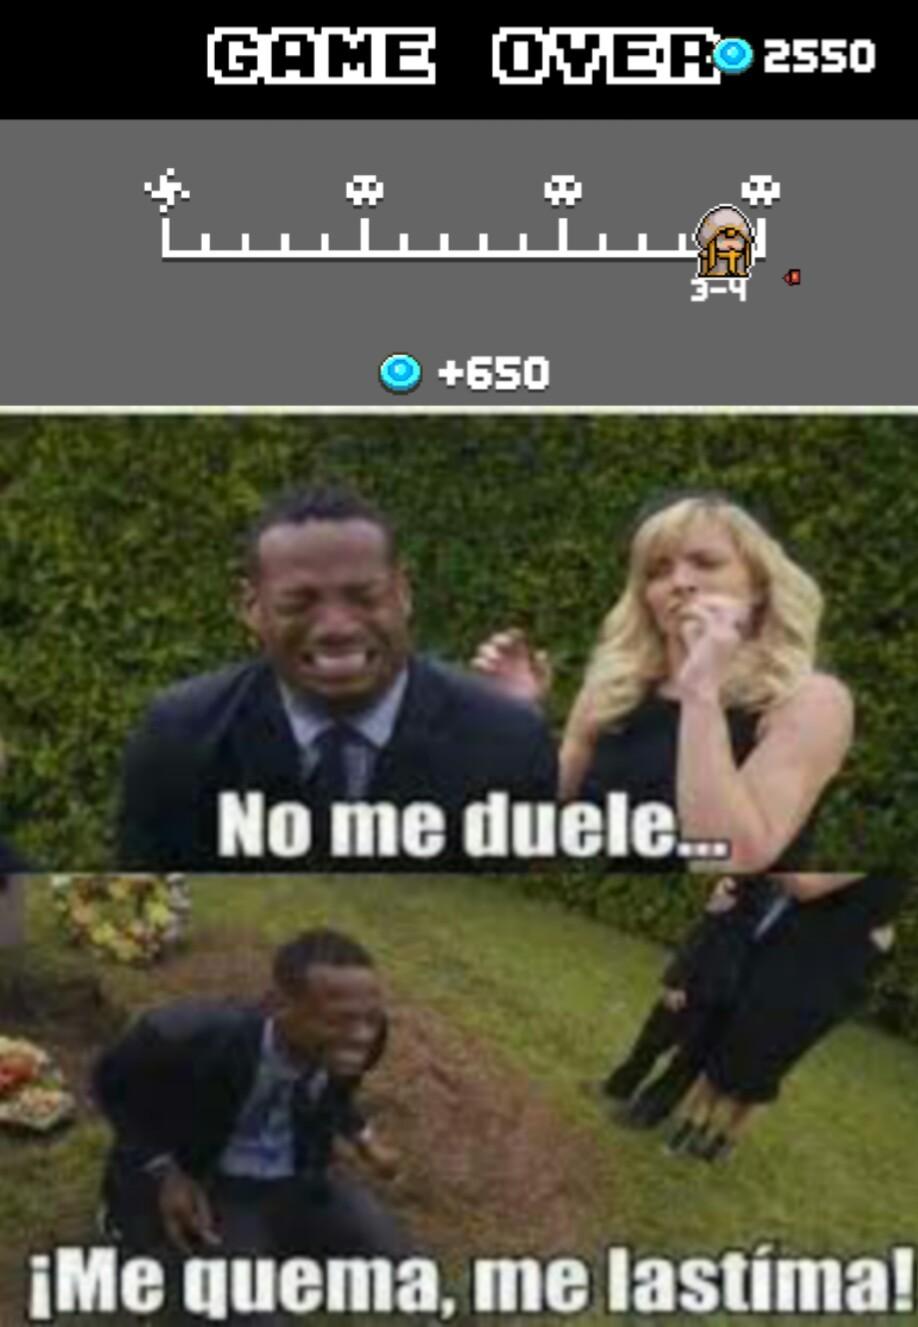 Meme 038